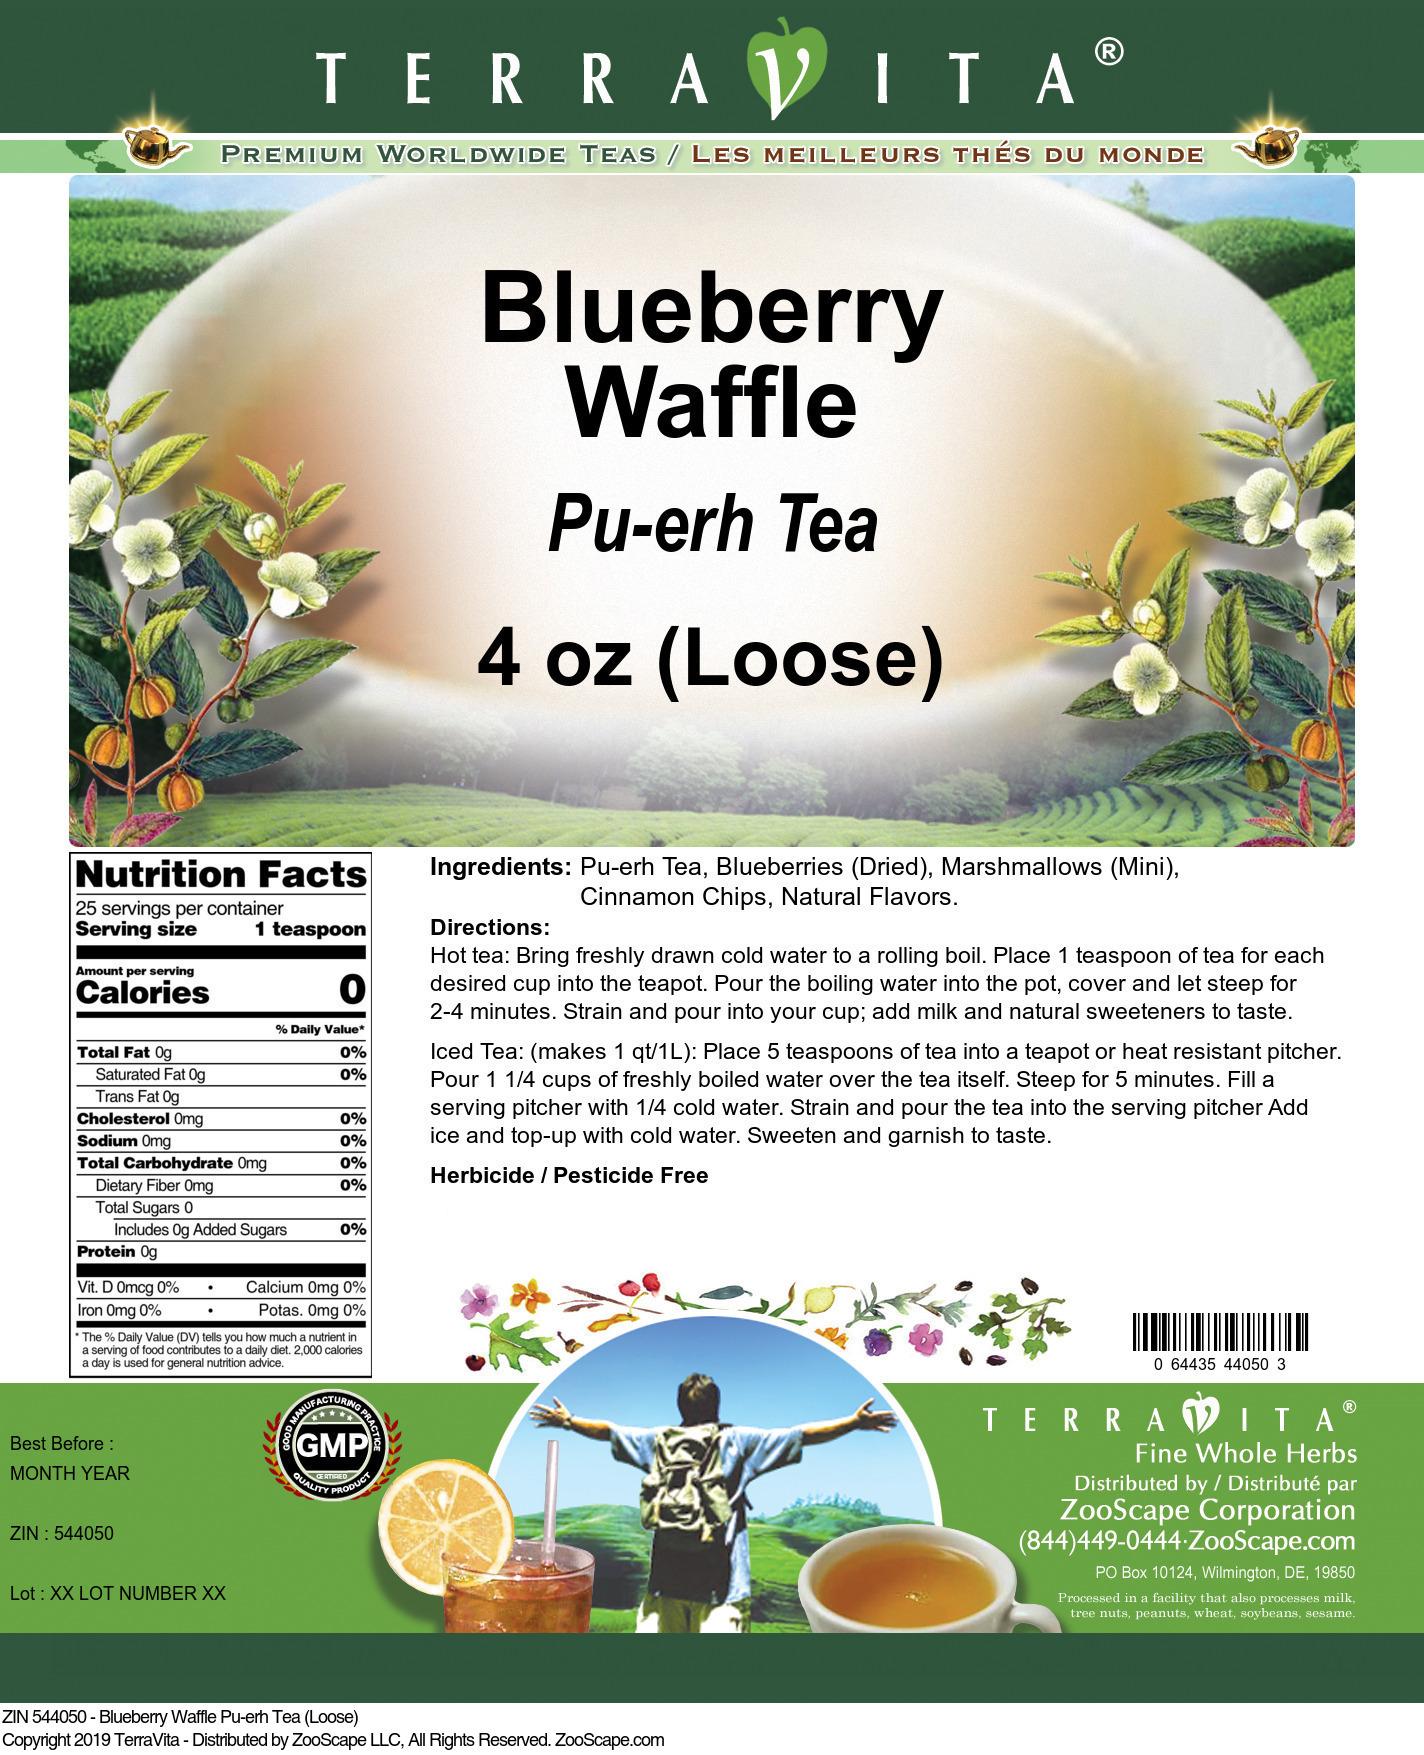 Blueberry Waffle Pu-erh Tea (Loose)